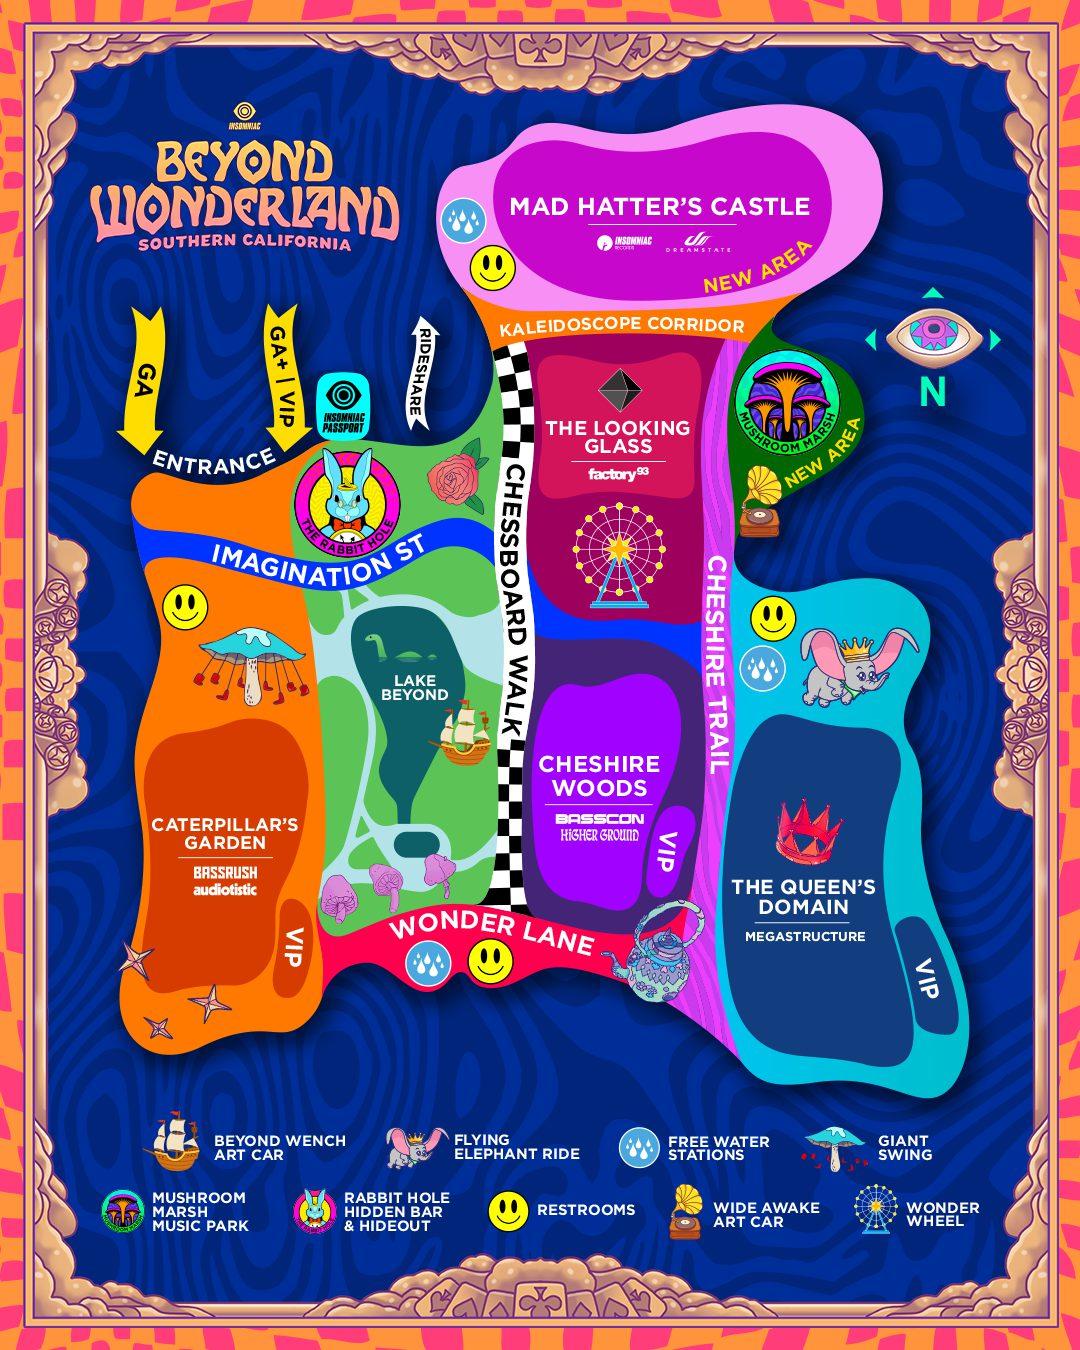 Beyond Wonderland SoCal 2020 Map